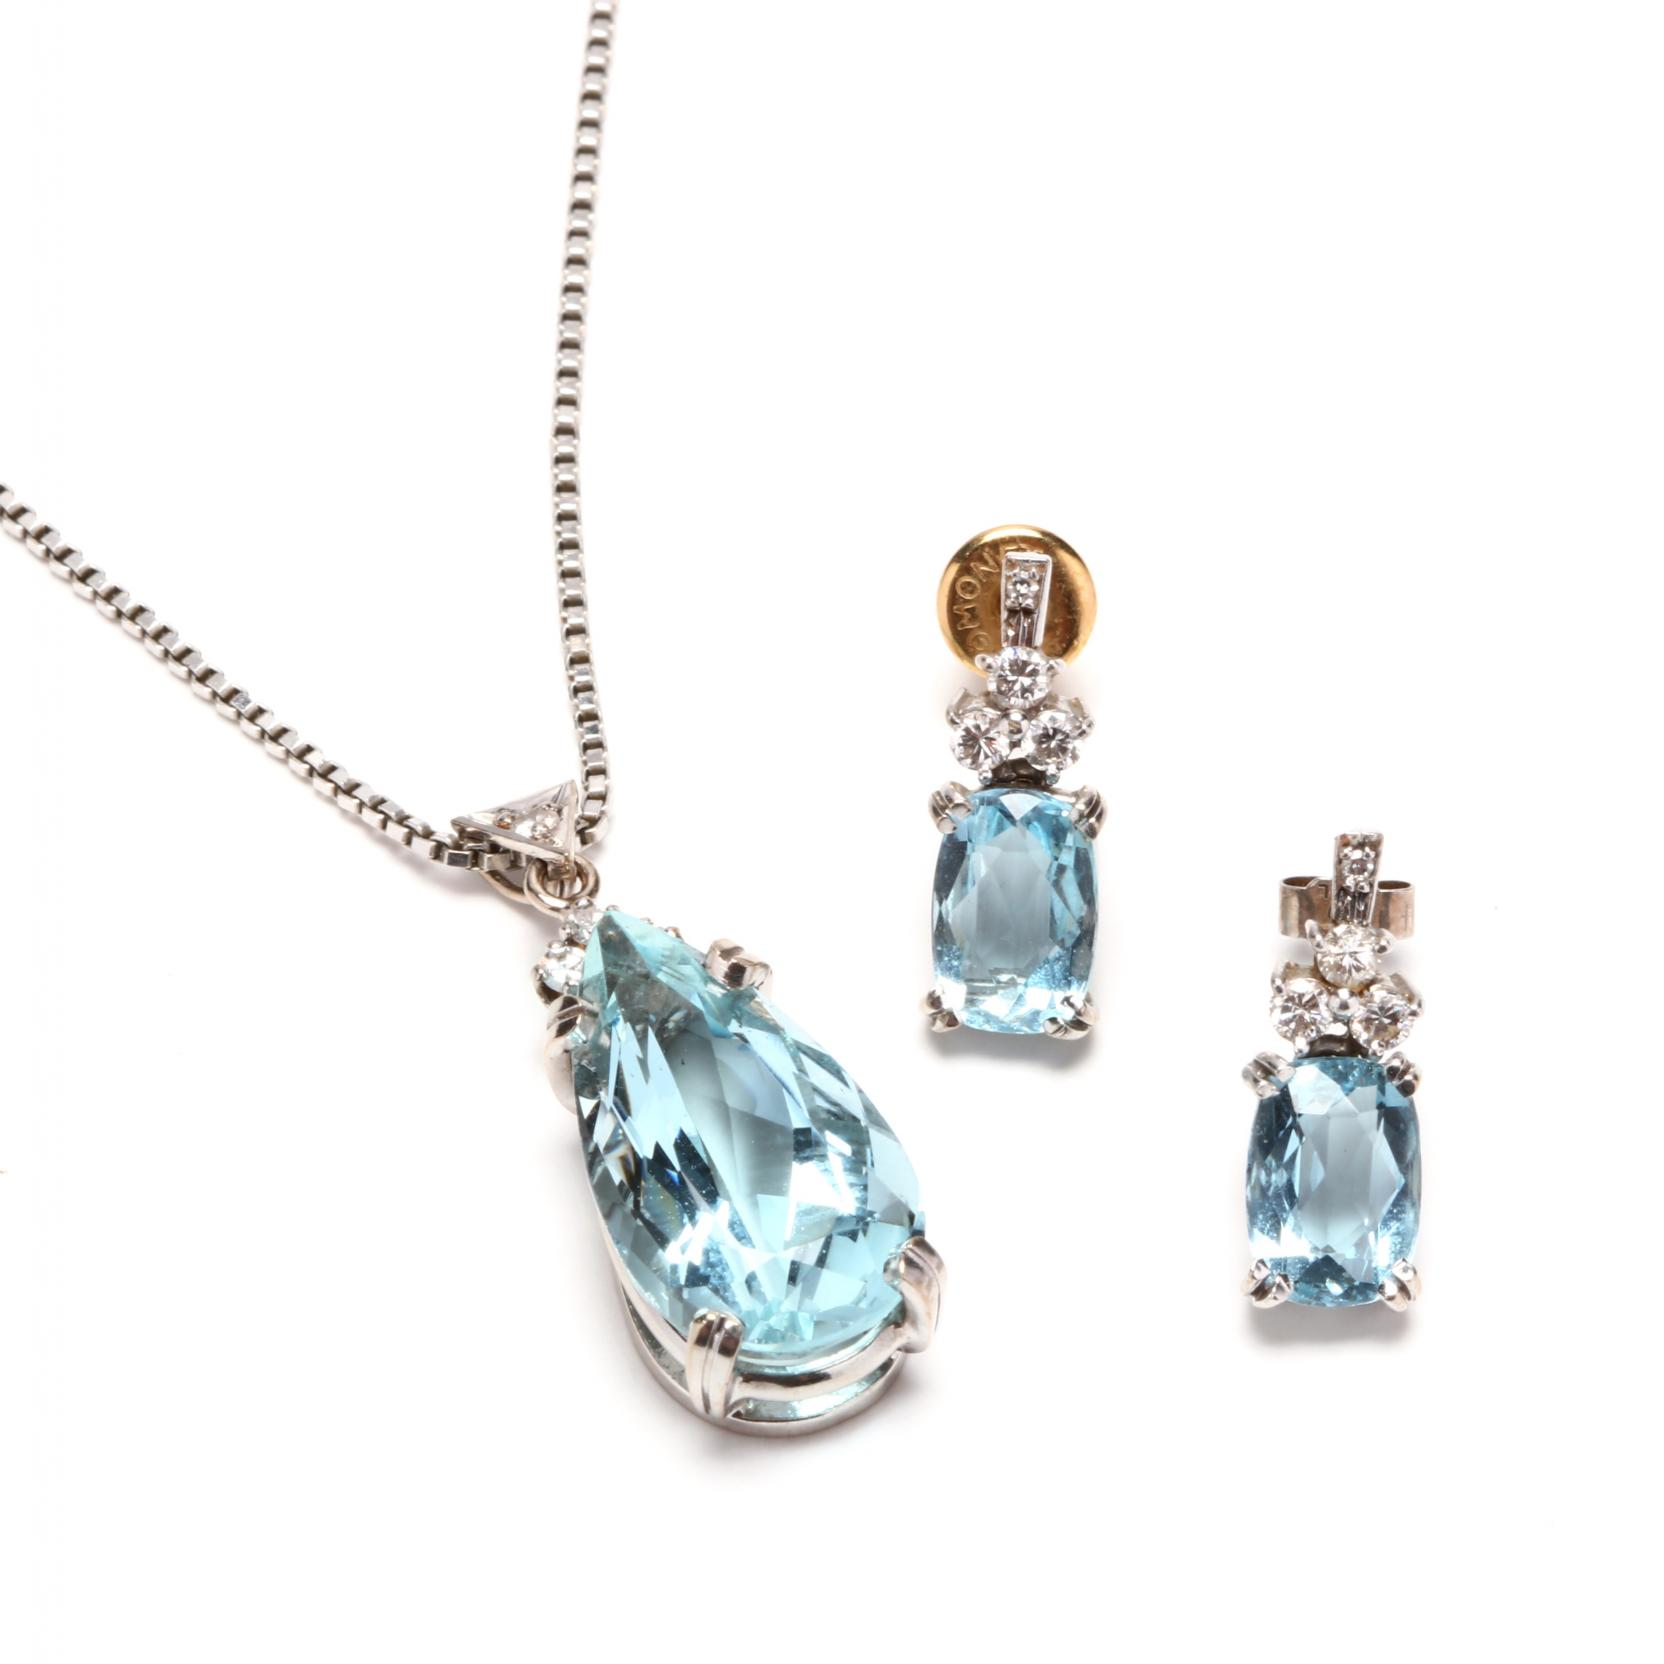 18kt-white-gold-aquamarine-and-diamond-demi-parure